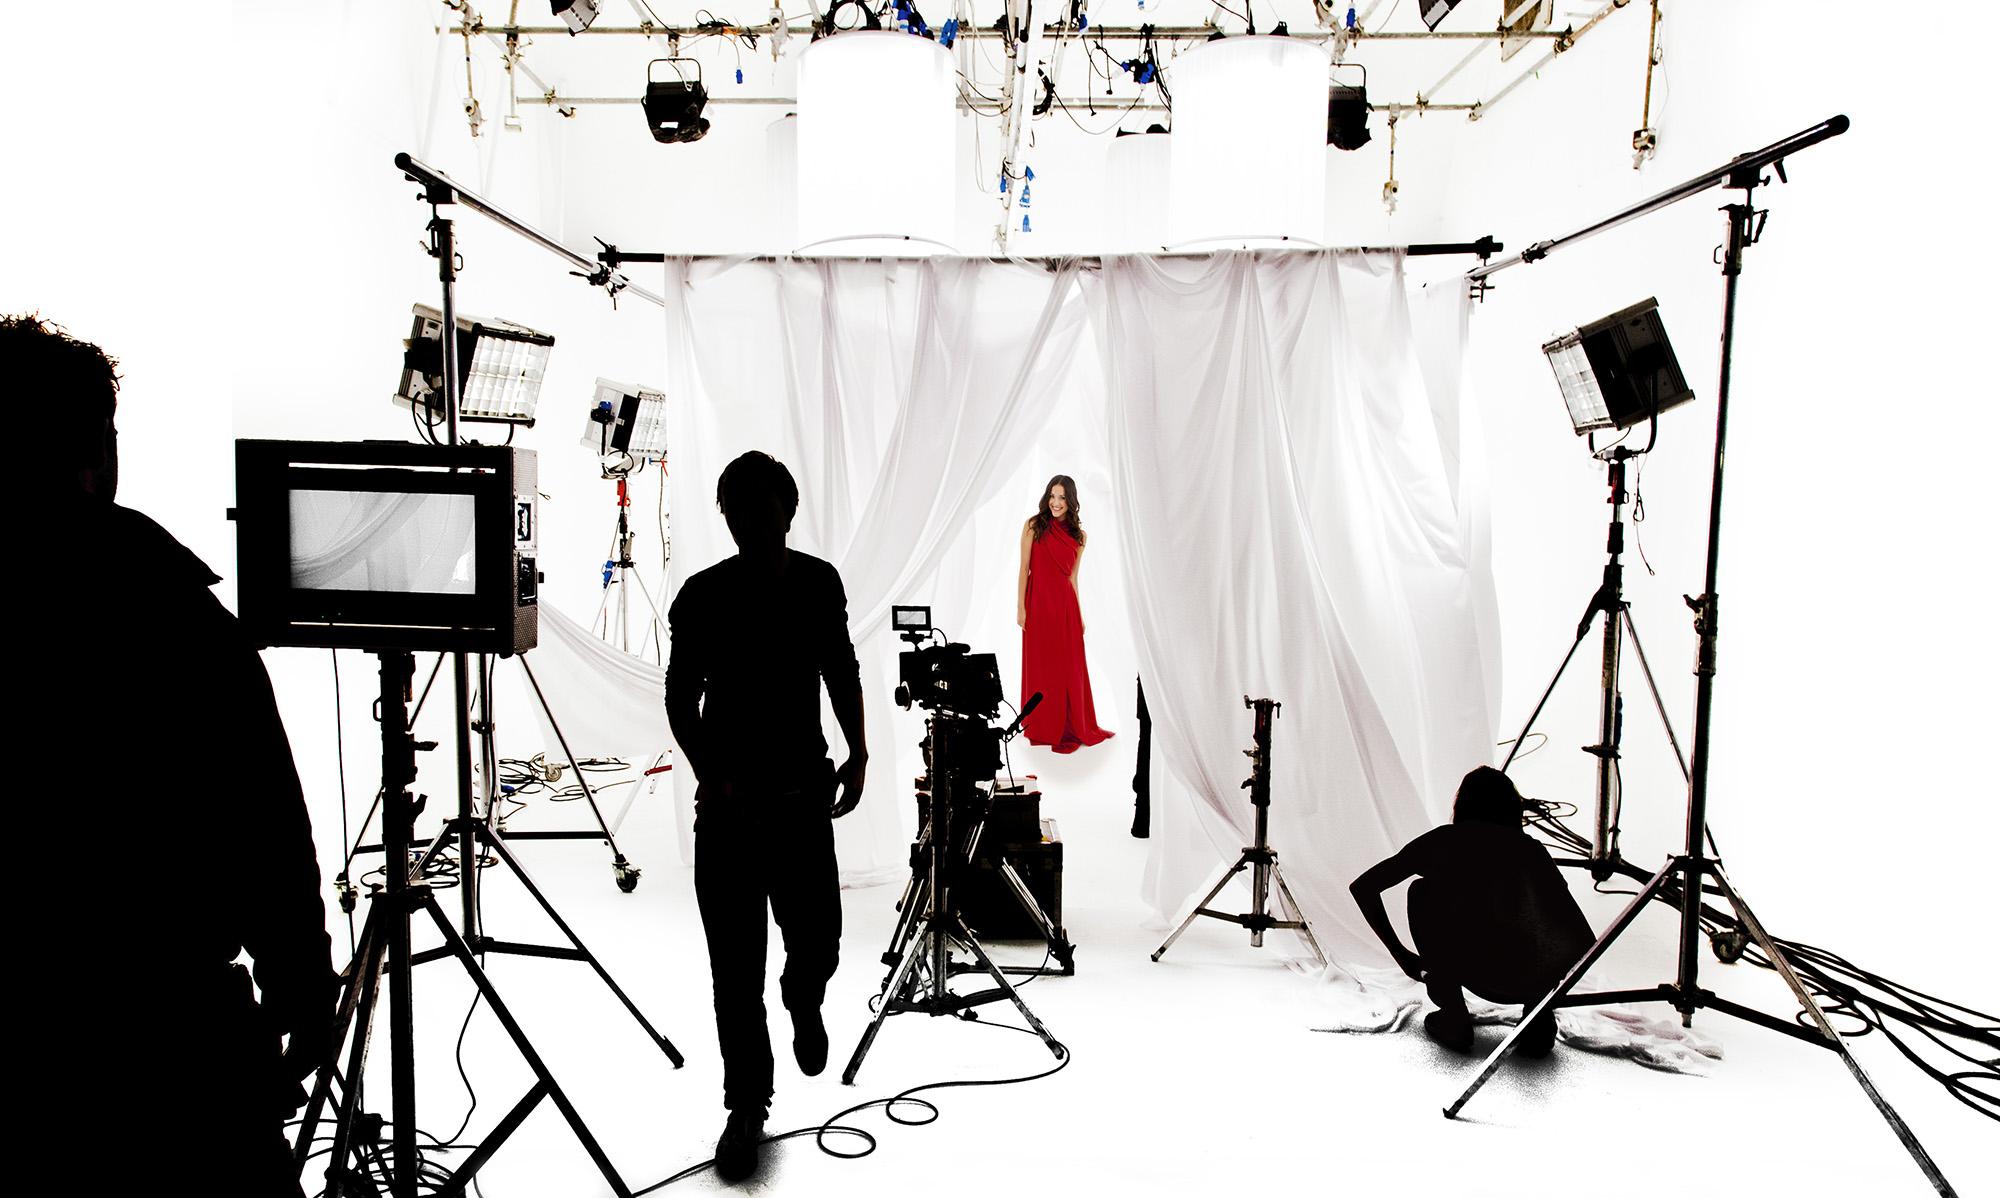 Contact David Ellison Films based in Blue Tower, Media City, Salford Manchester UK, M502ST